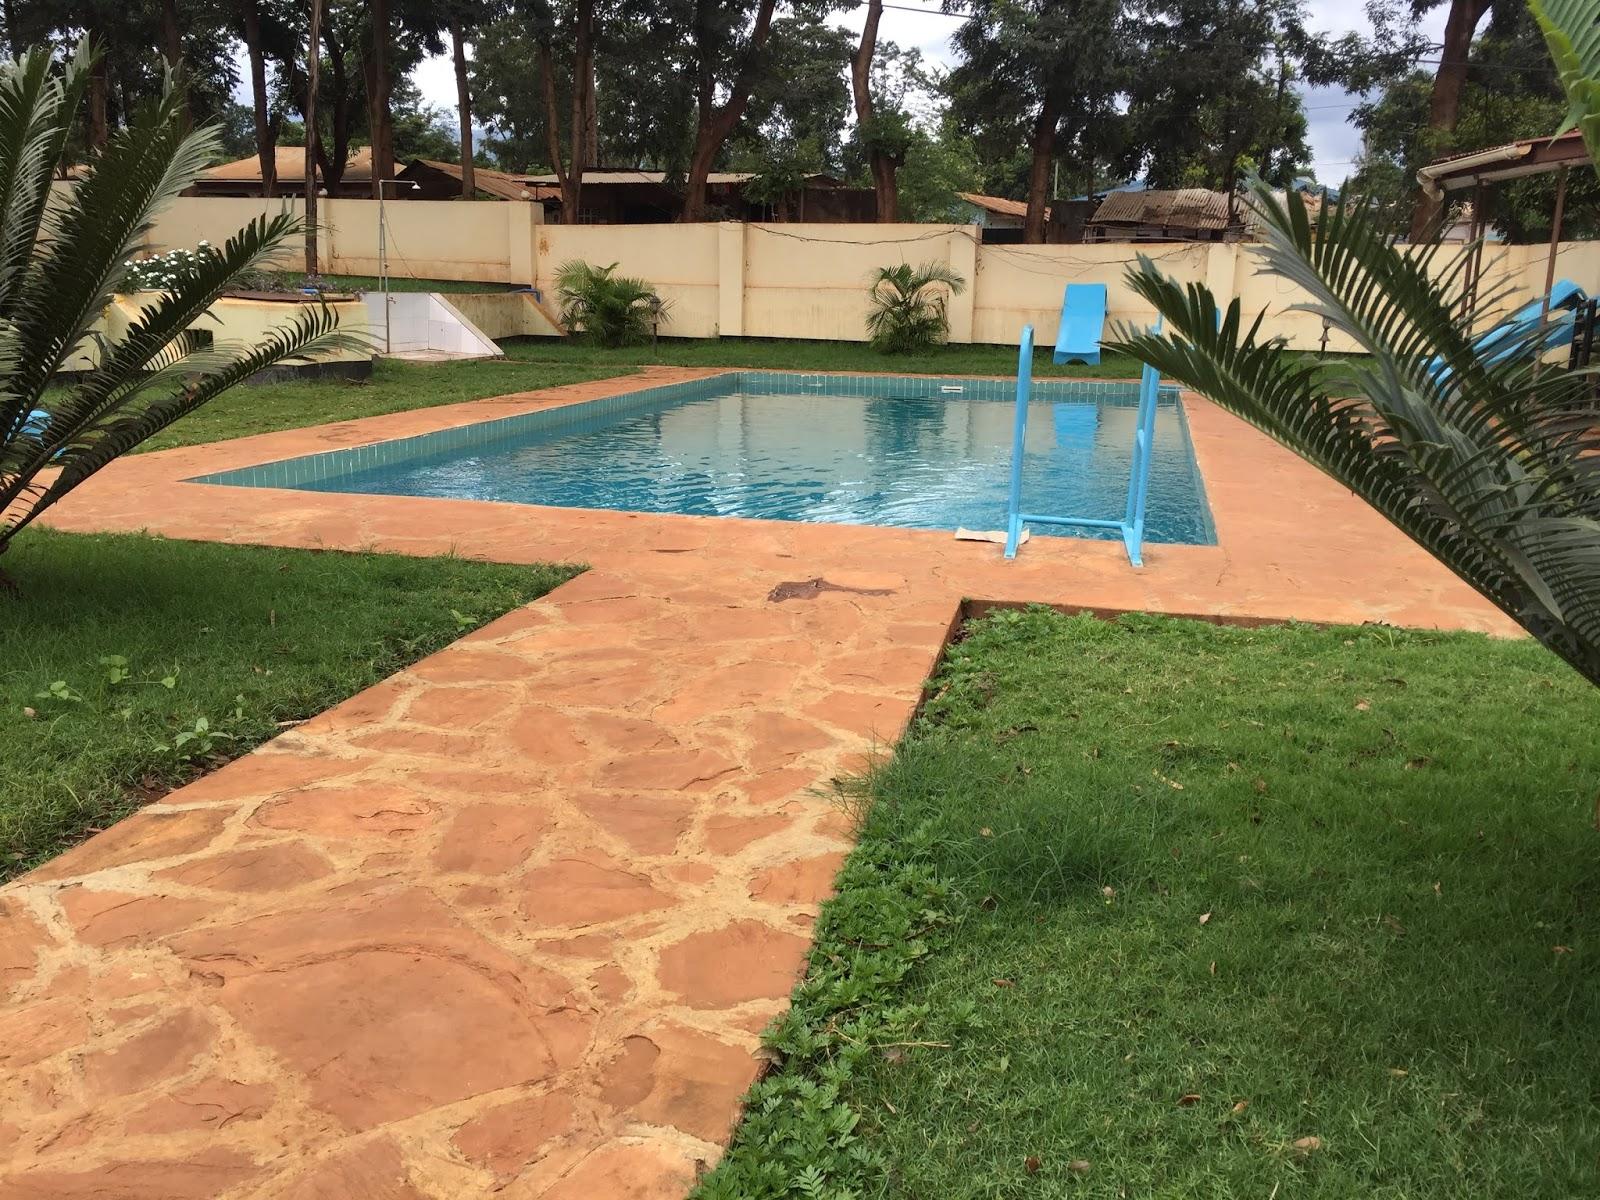 Keys lodge, hotel, hostel, travel, holiday, climbing, hiking, kilimanjaro, tanzania, moshi